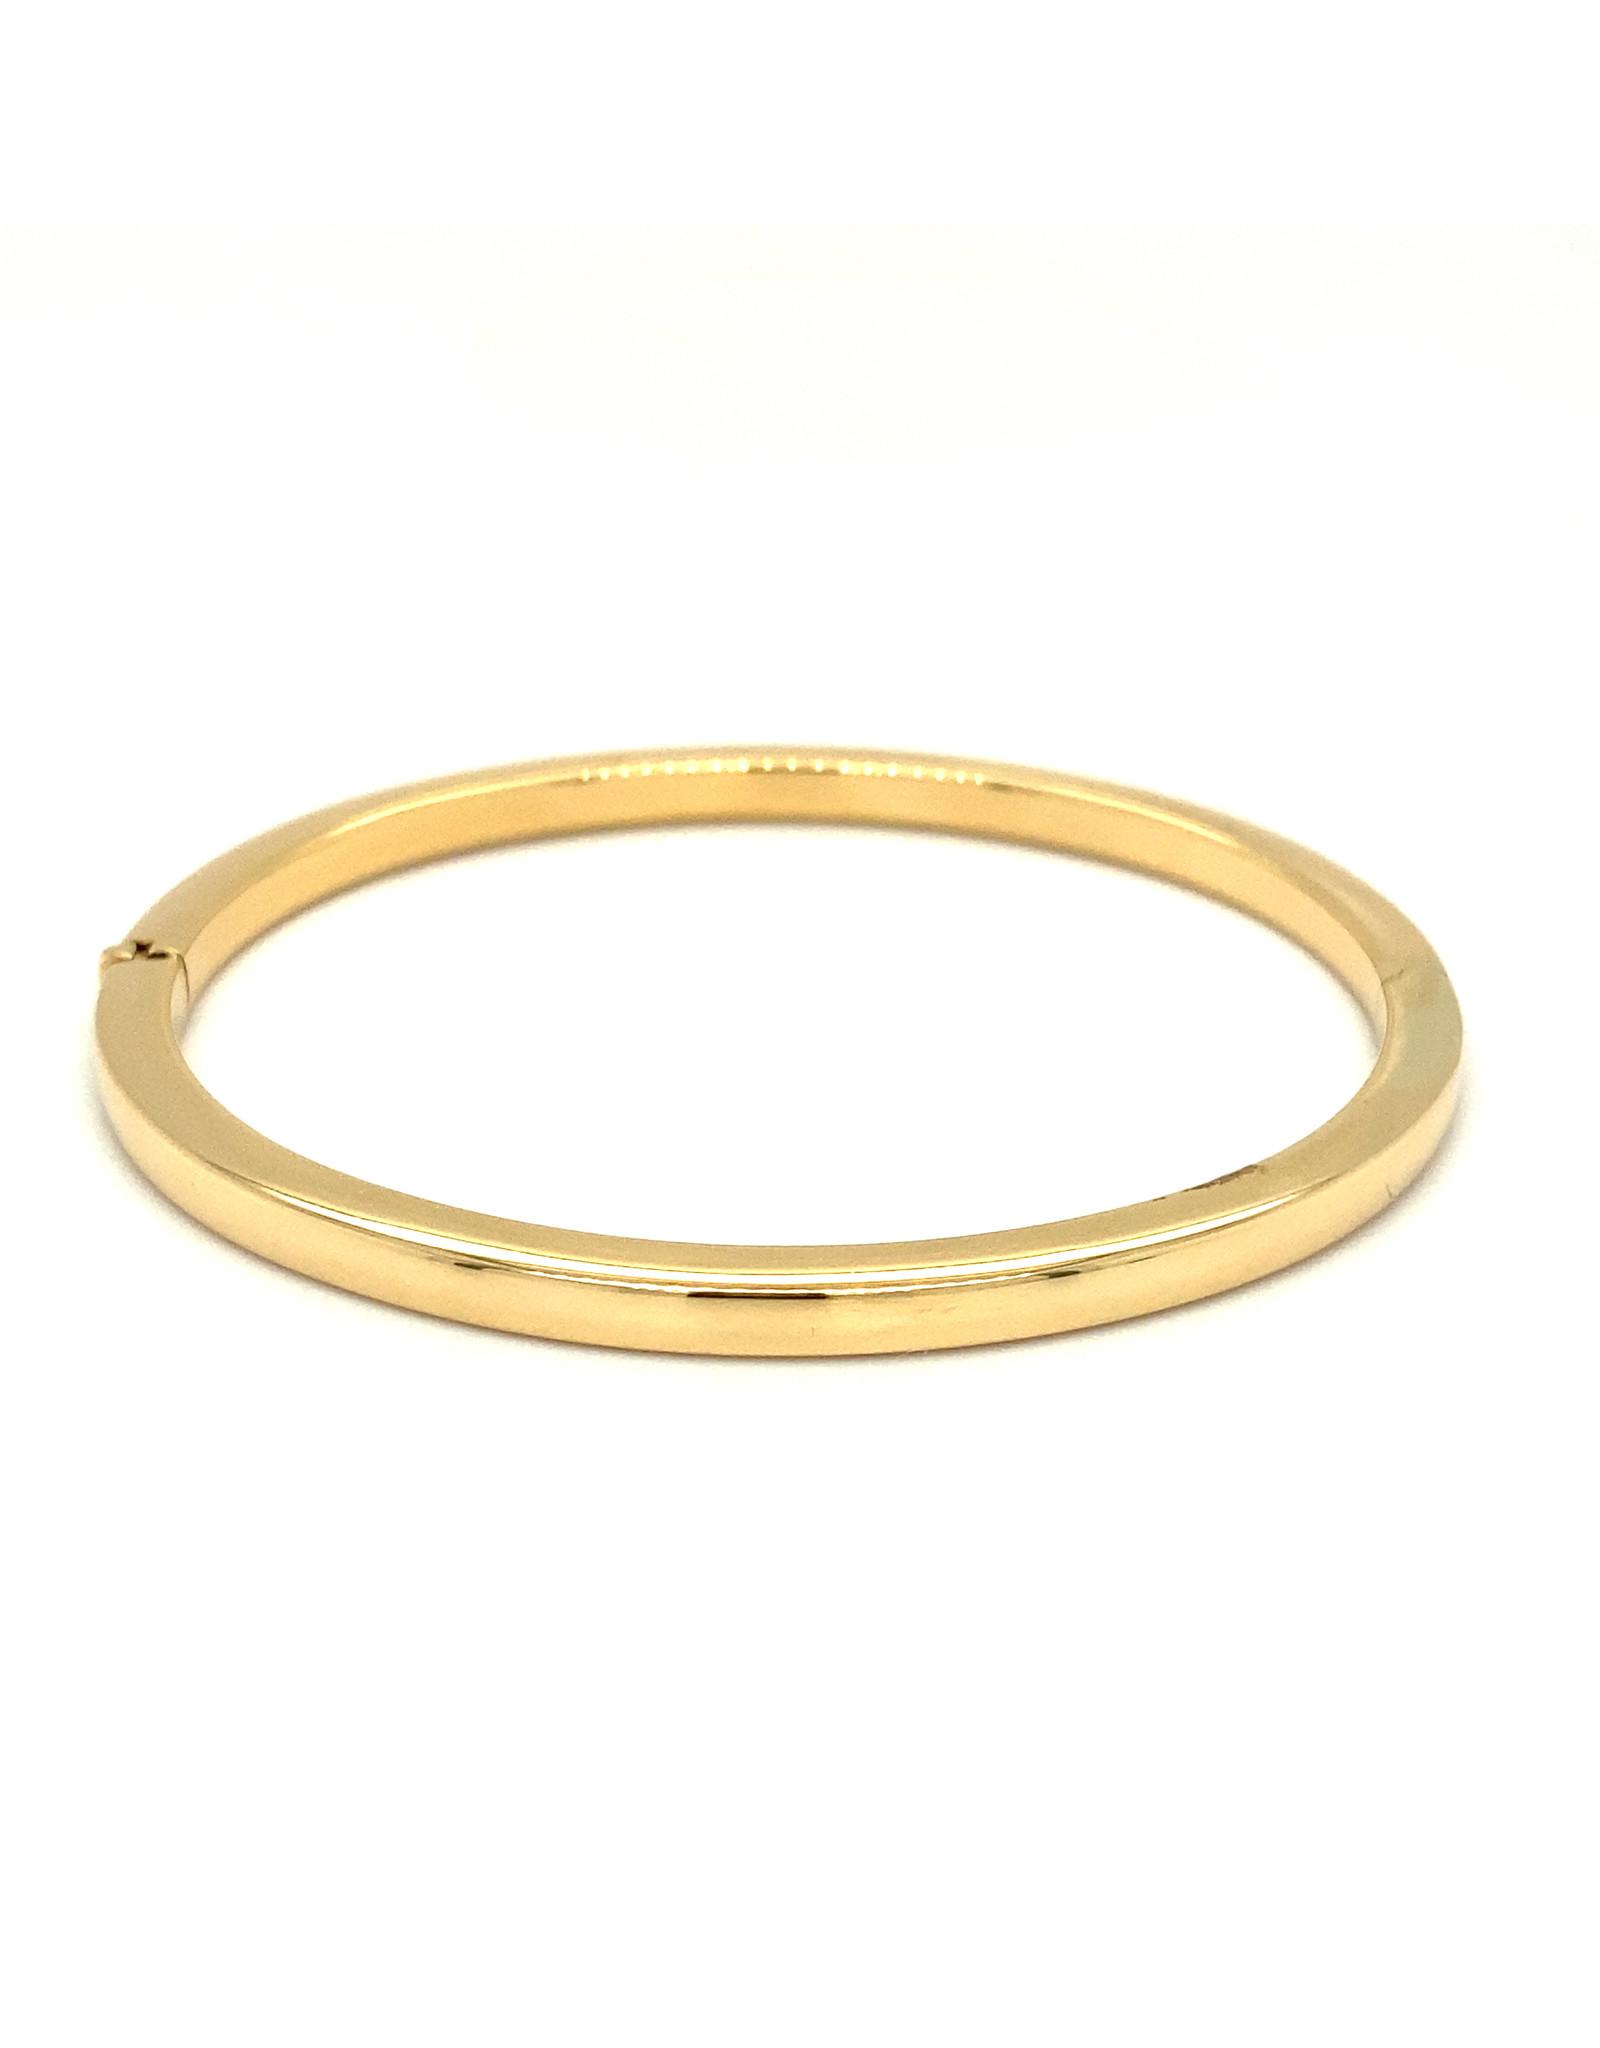 Clioro Armband geel goud esclave